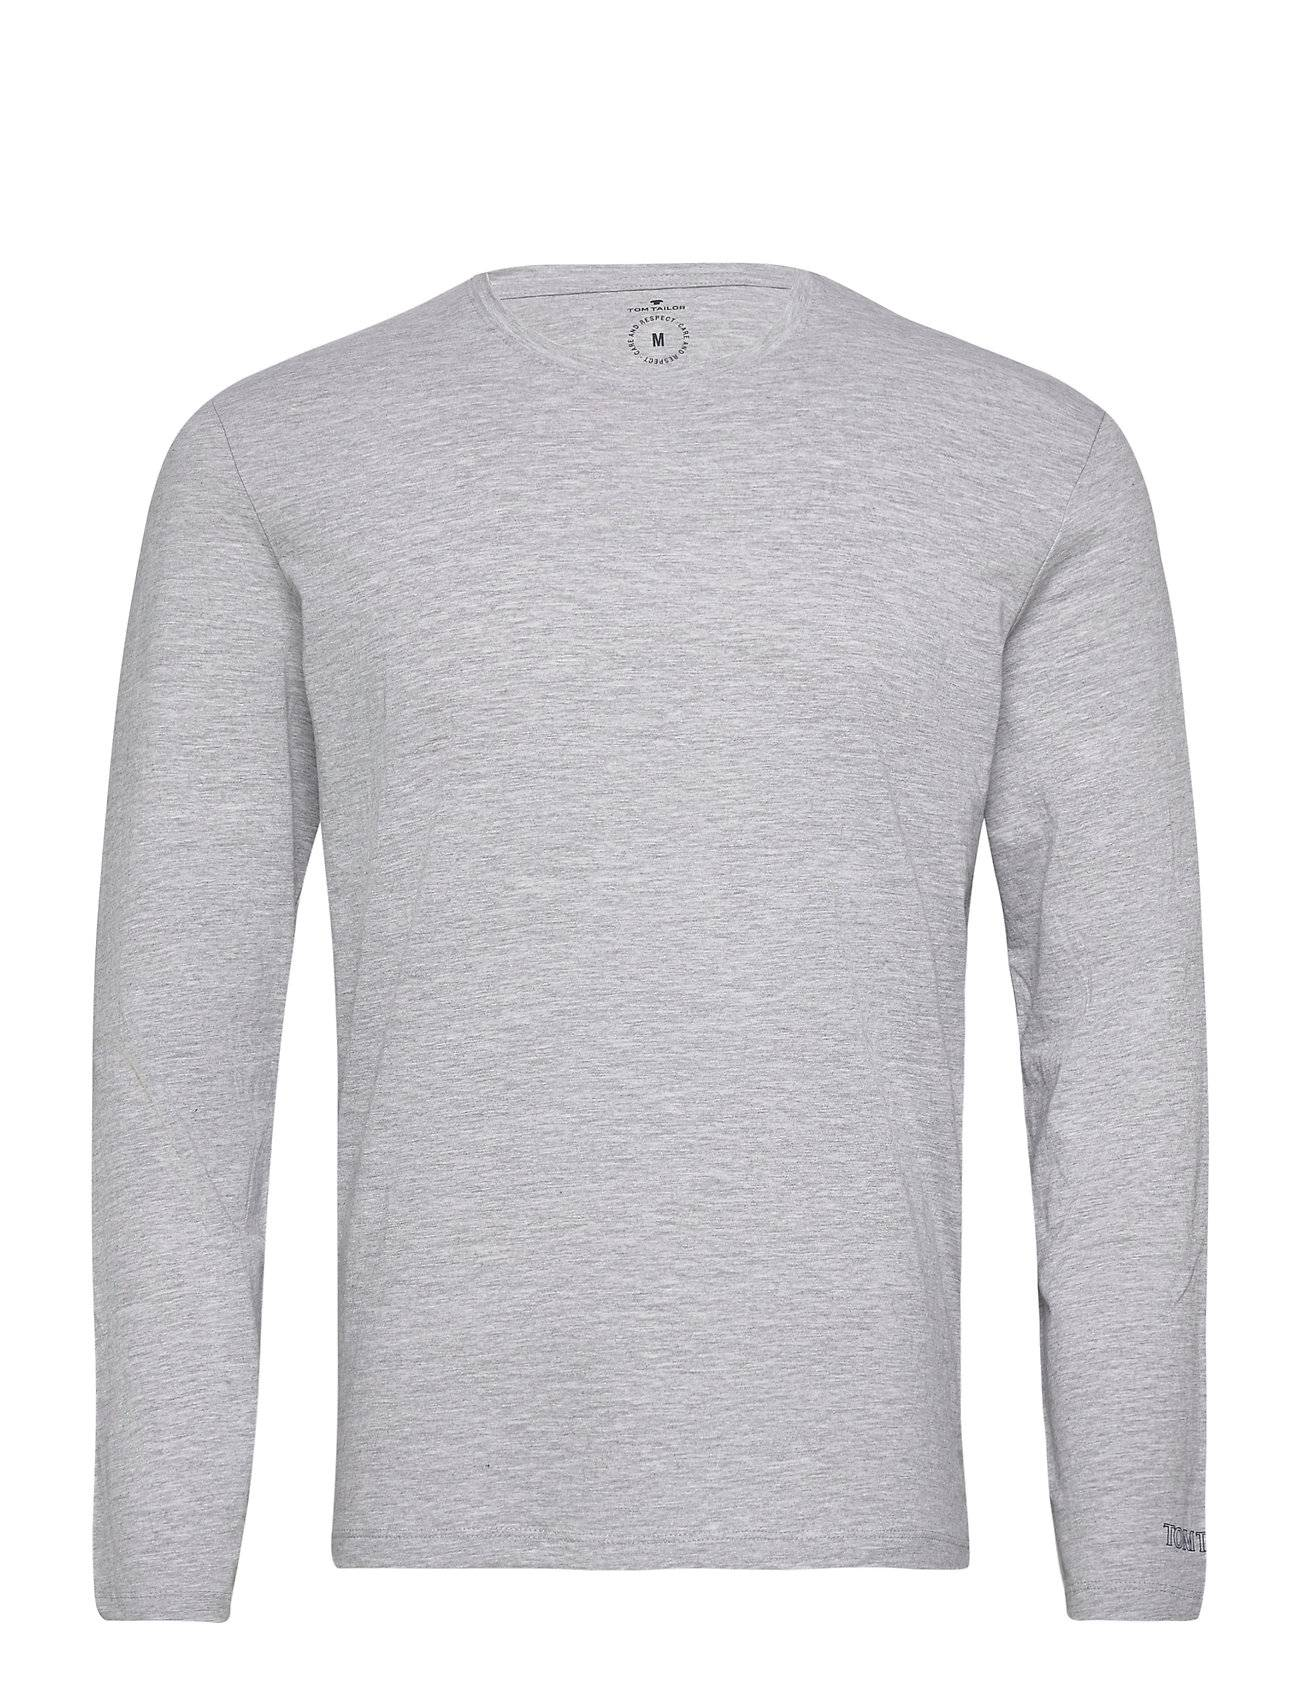 Tom Tailor Basic Organi T-shirts Long-sleeved Harmaa Tom Tailor